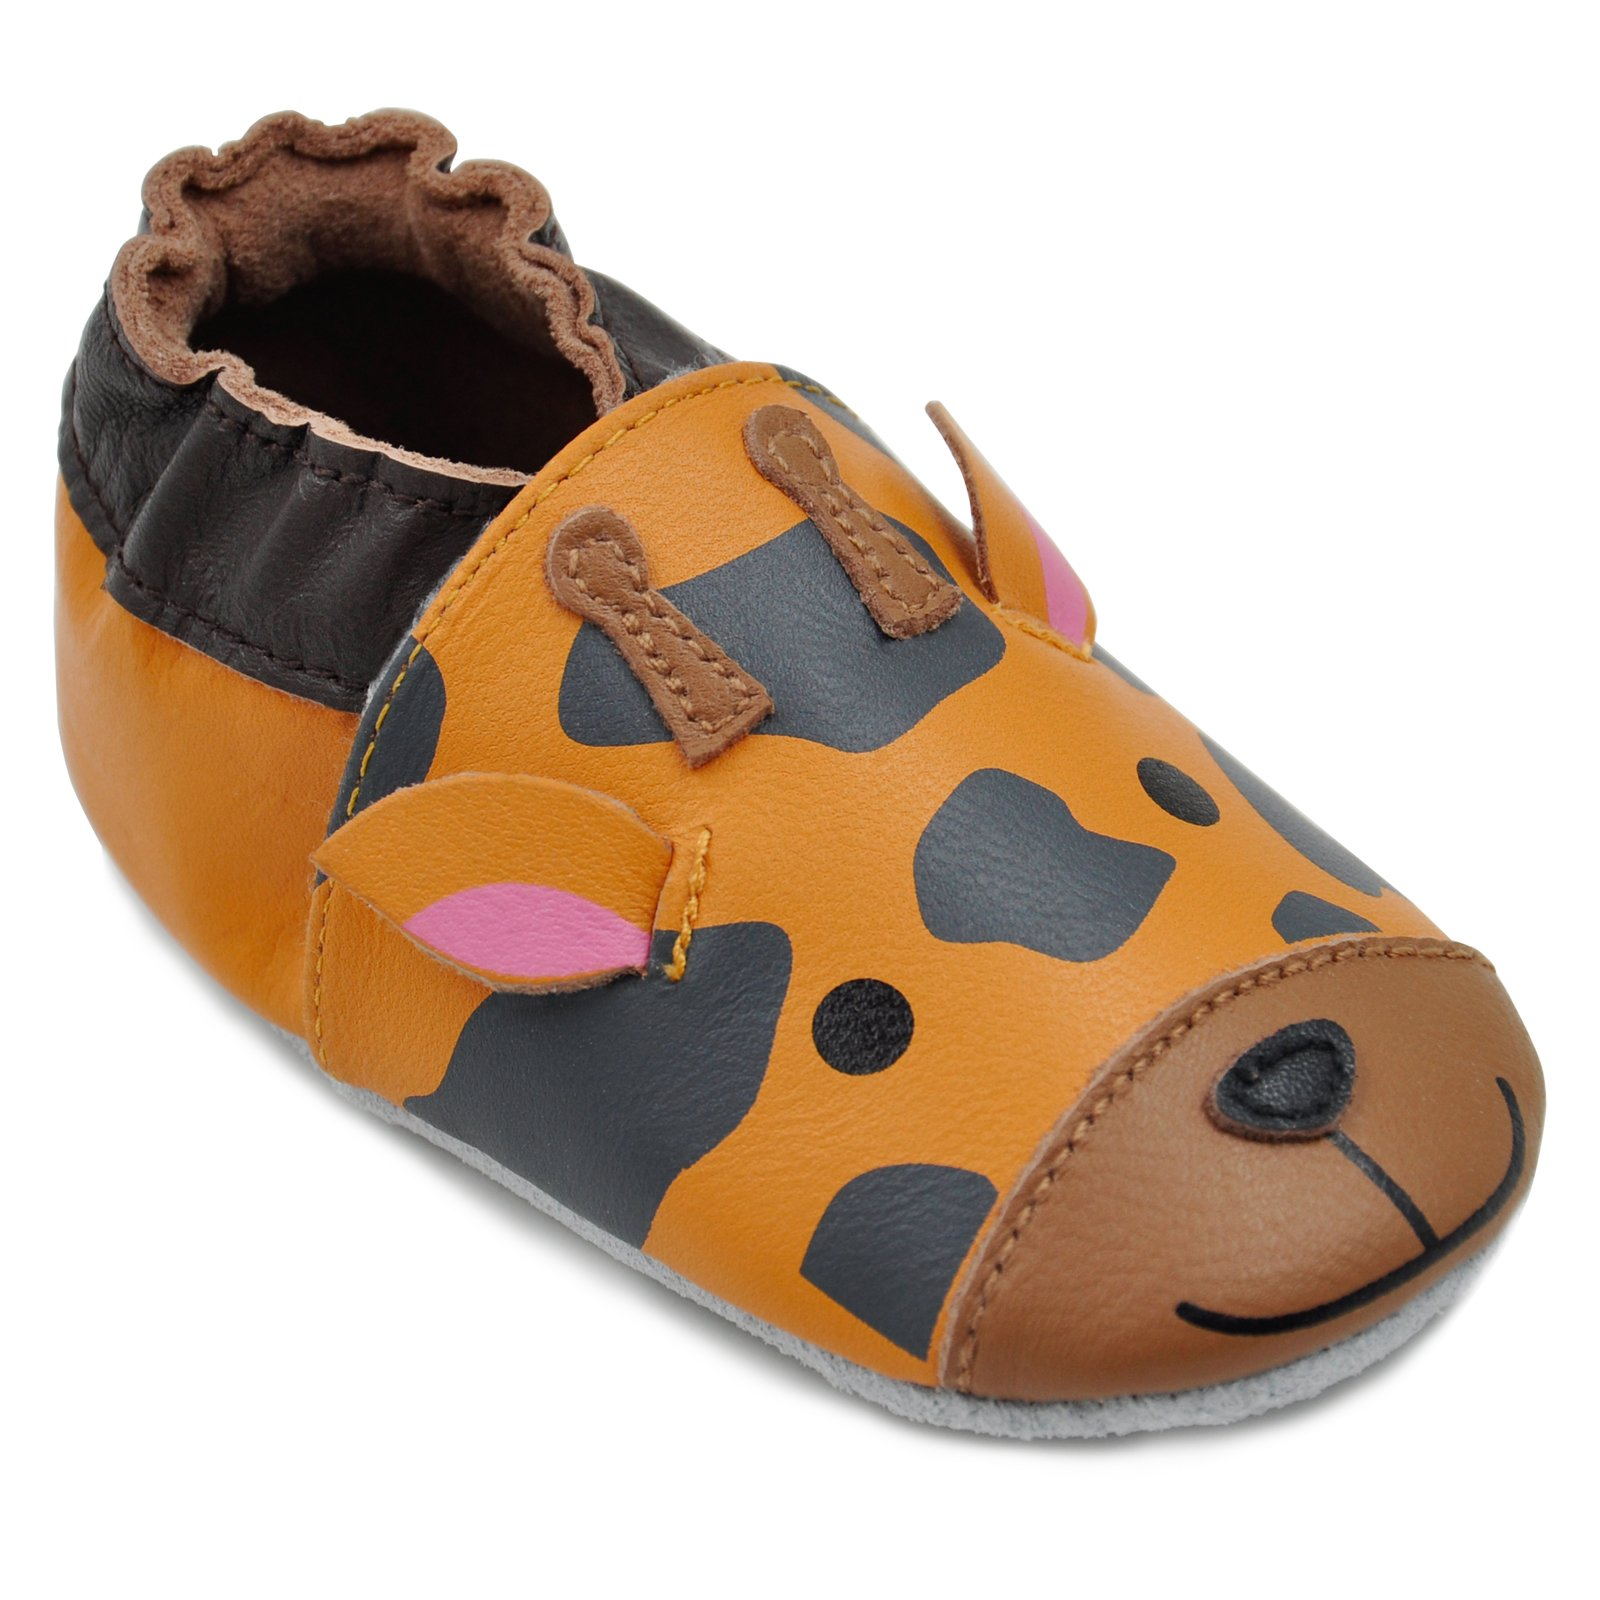 Kimi + Kai Baby Unisex Lambskin Leather Soft Sole Shoes - Giraffe (6-12 Months) Orange by Kimi & Kai